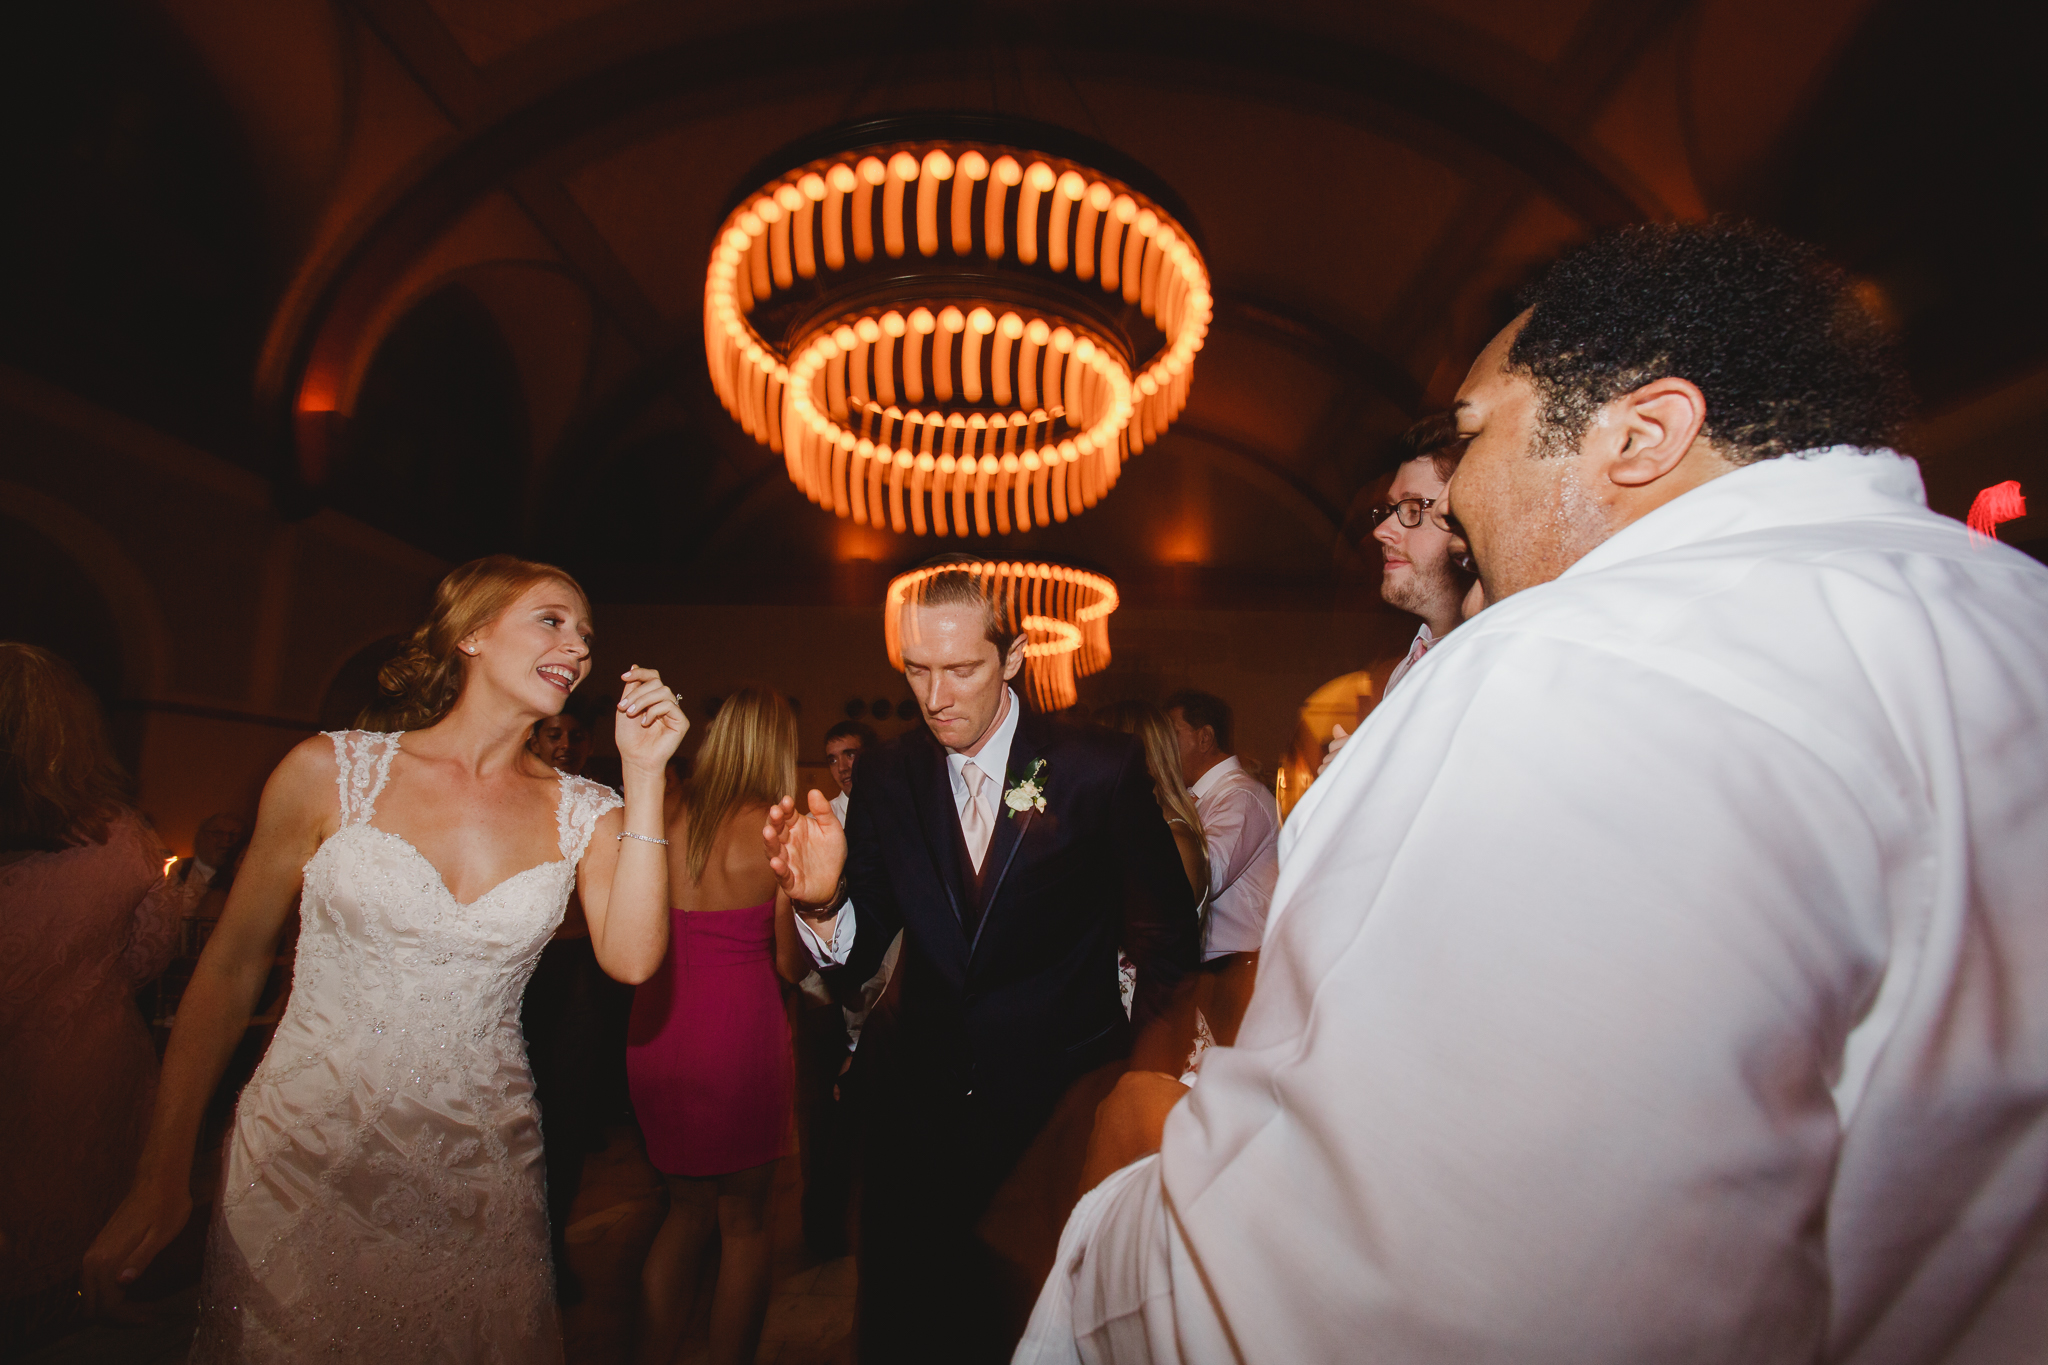 Michael and Kelly - the ashton depot - wedding DFW - wedding photographer- elizalde photography (129 of 150).jpg